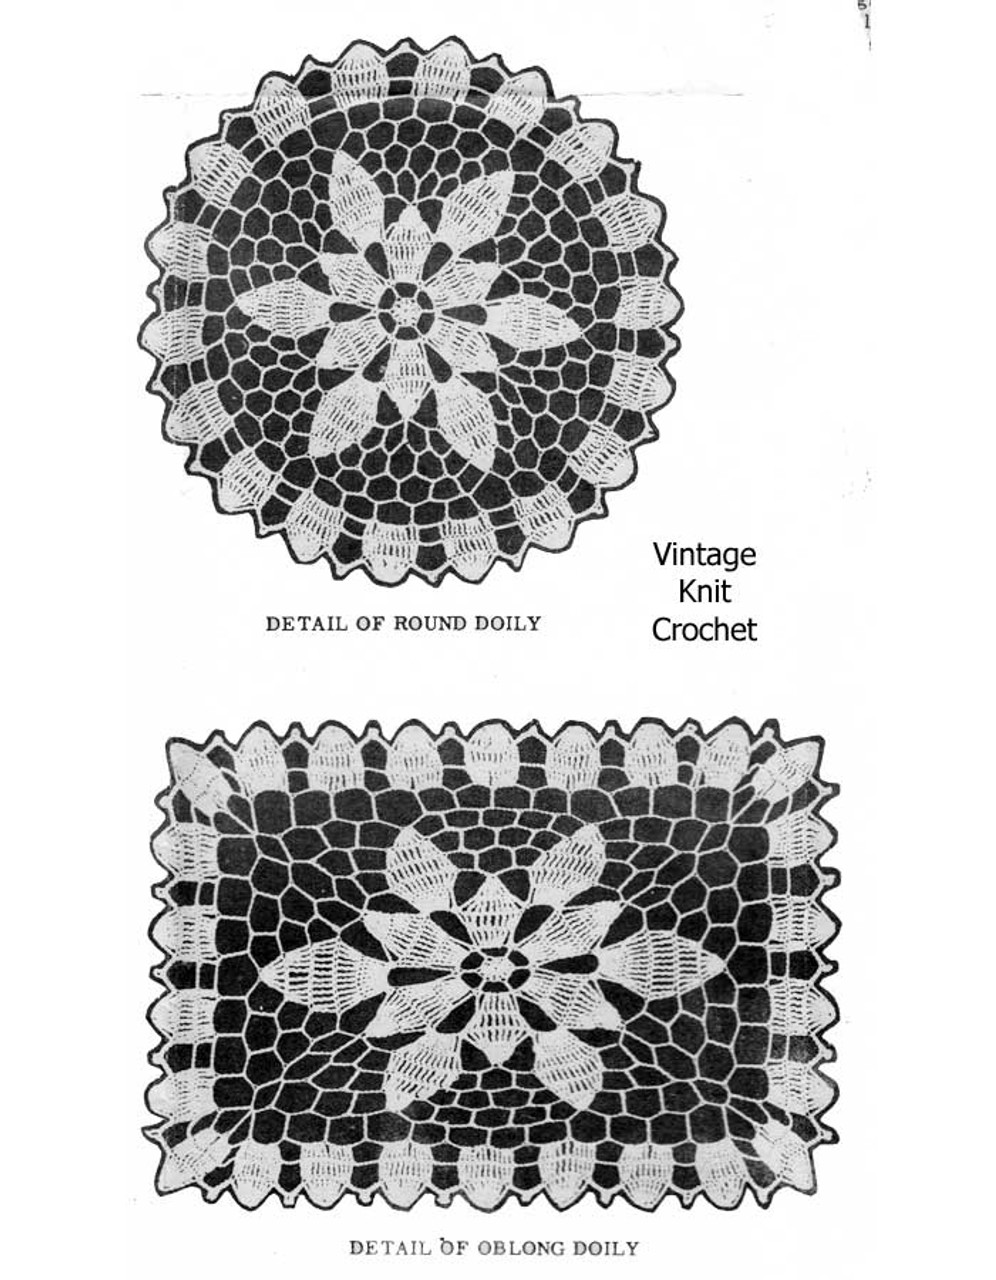 Round Square Doily Pattern Illustration, Laura wheeler 776